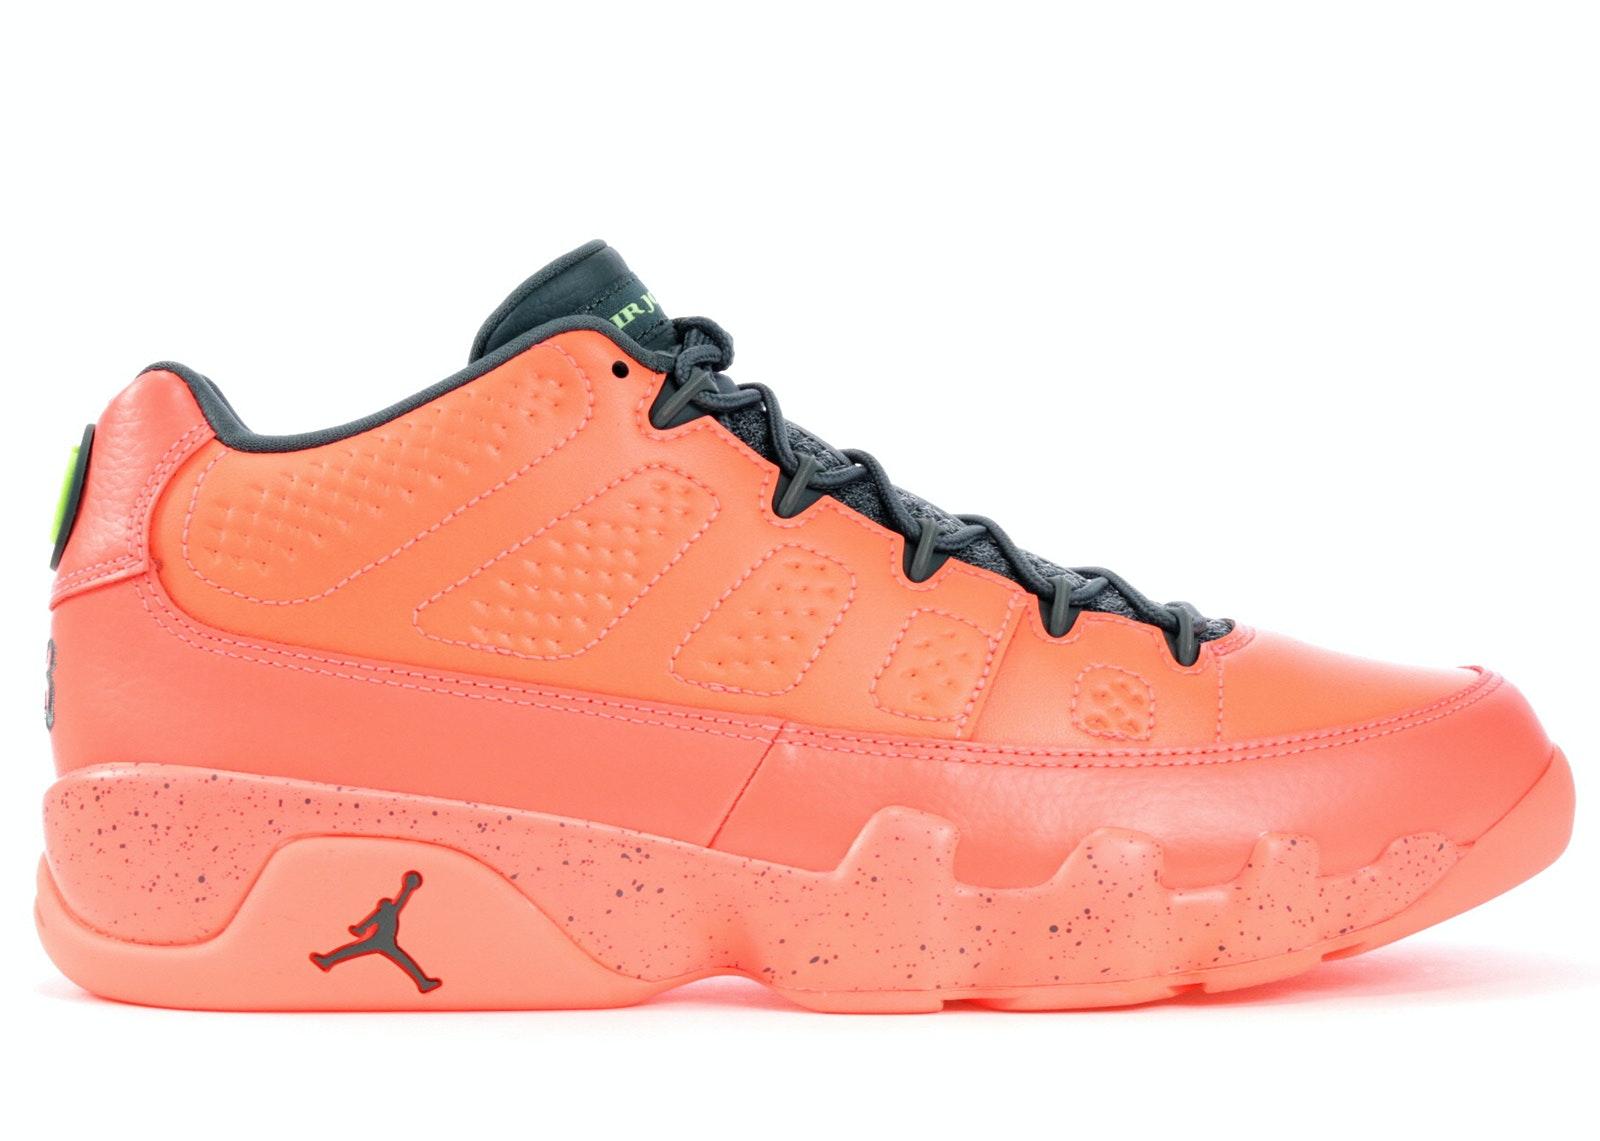 Jordan 9 Retro Low Bright Mango